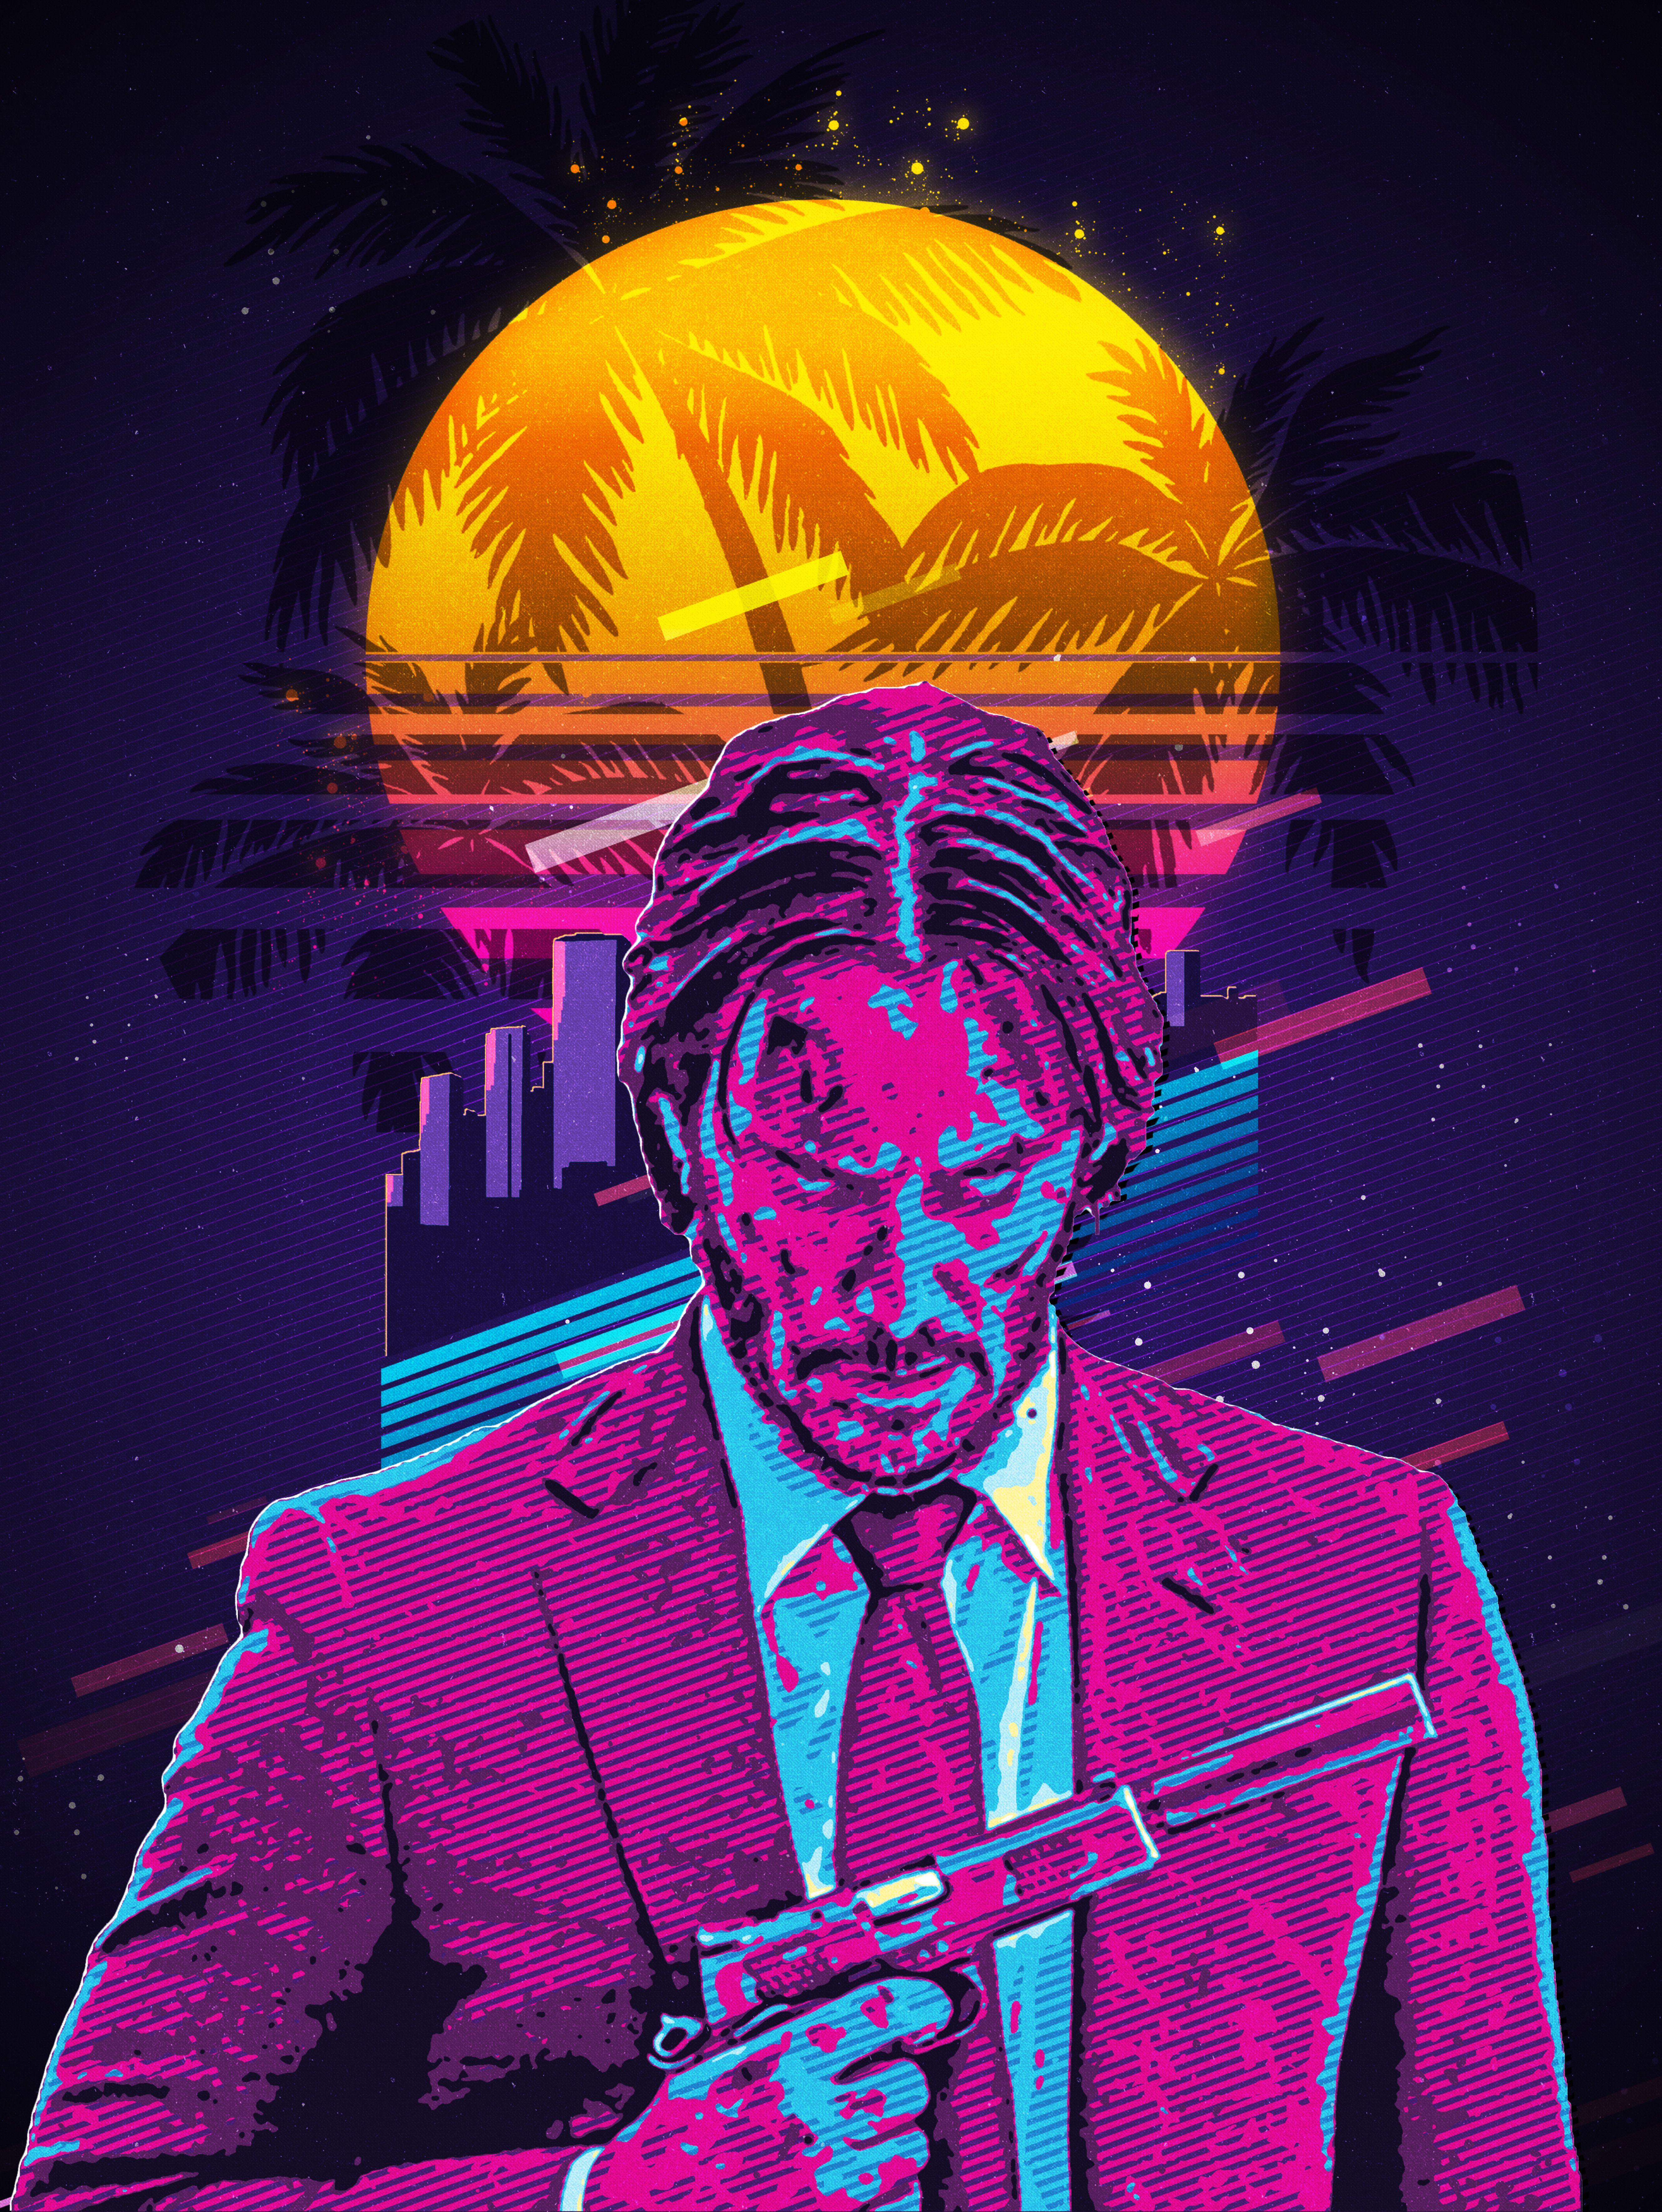 John Wick Retro Retro Art Keanu Reeves John Wick Poster Art